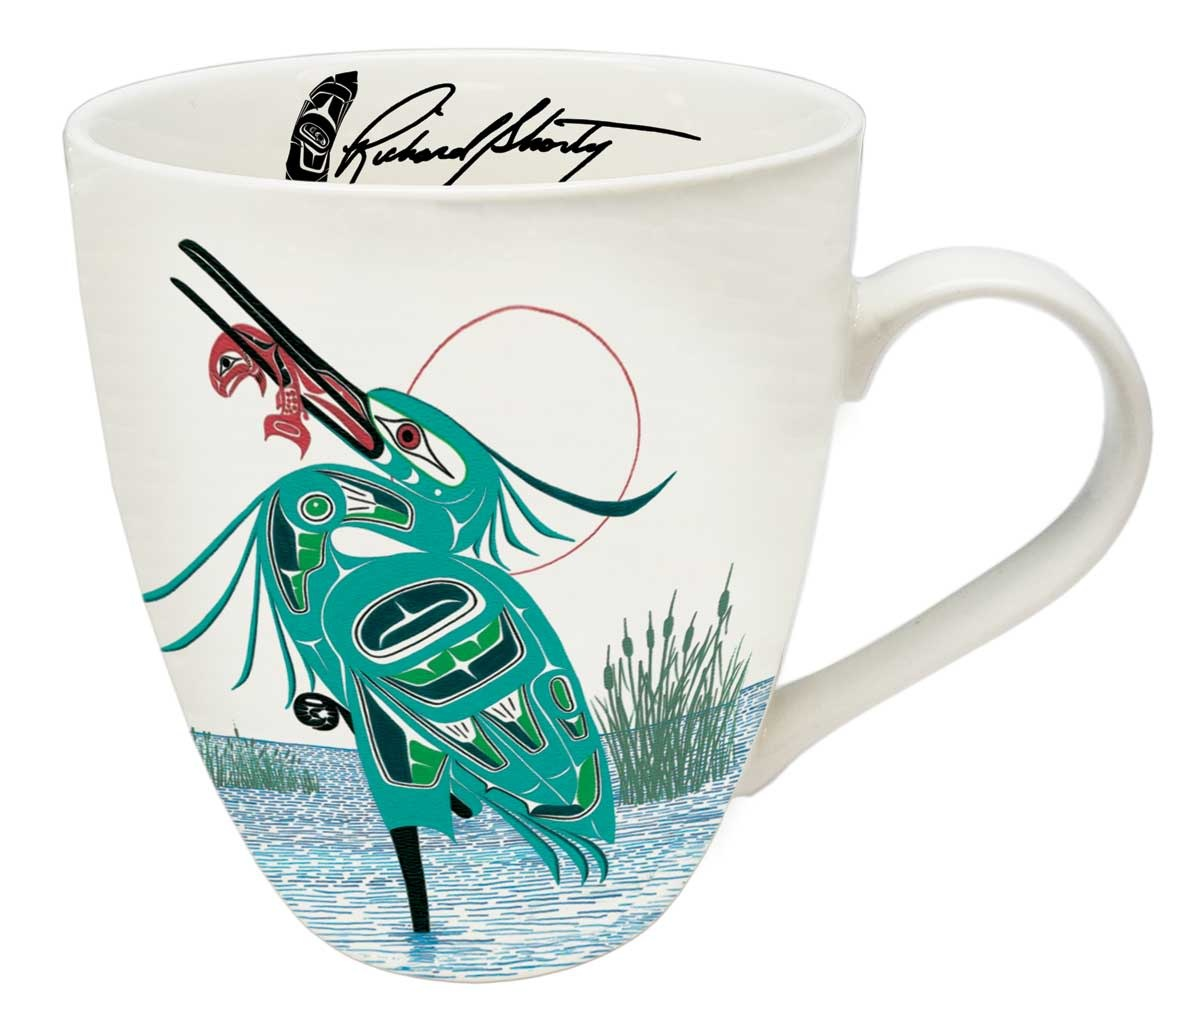 Porcelain Artist Mug - Green Heron by Richard Shorty-1